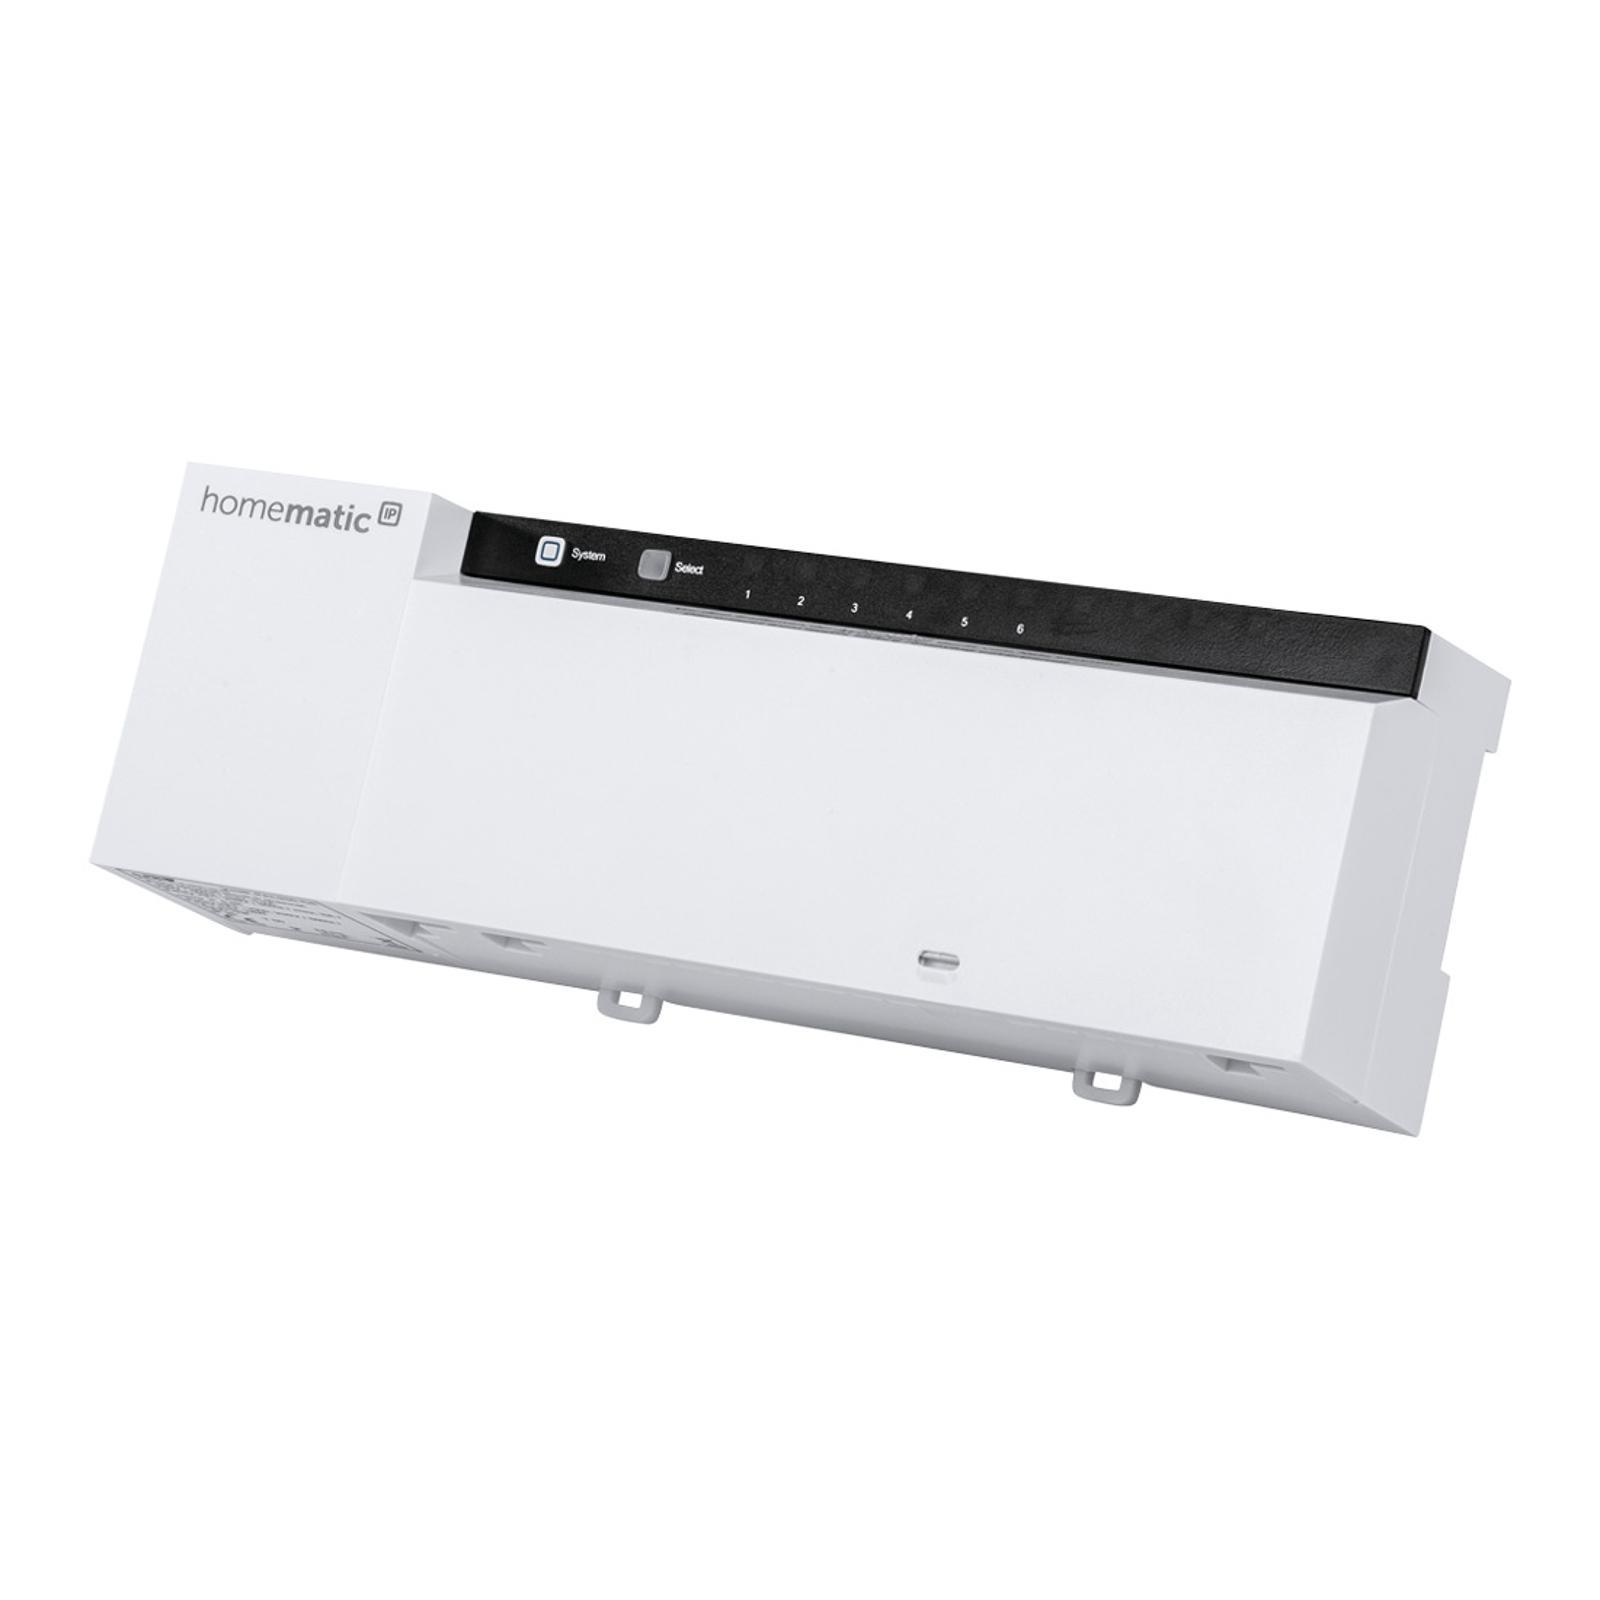 Homematic IP-vloerverwarmingsactuator, 6x, 24 V